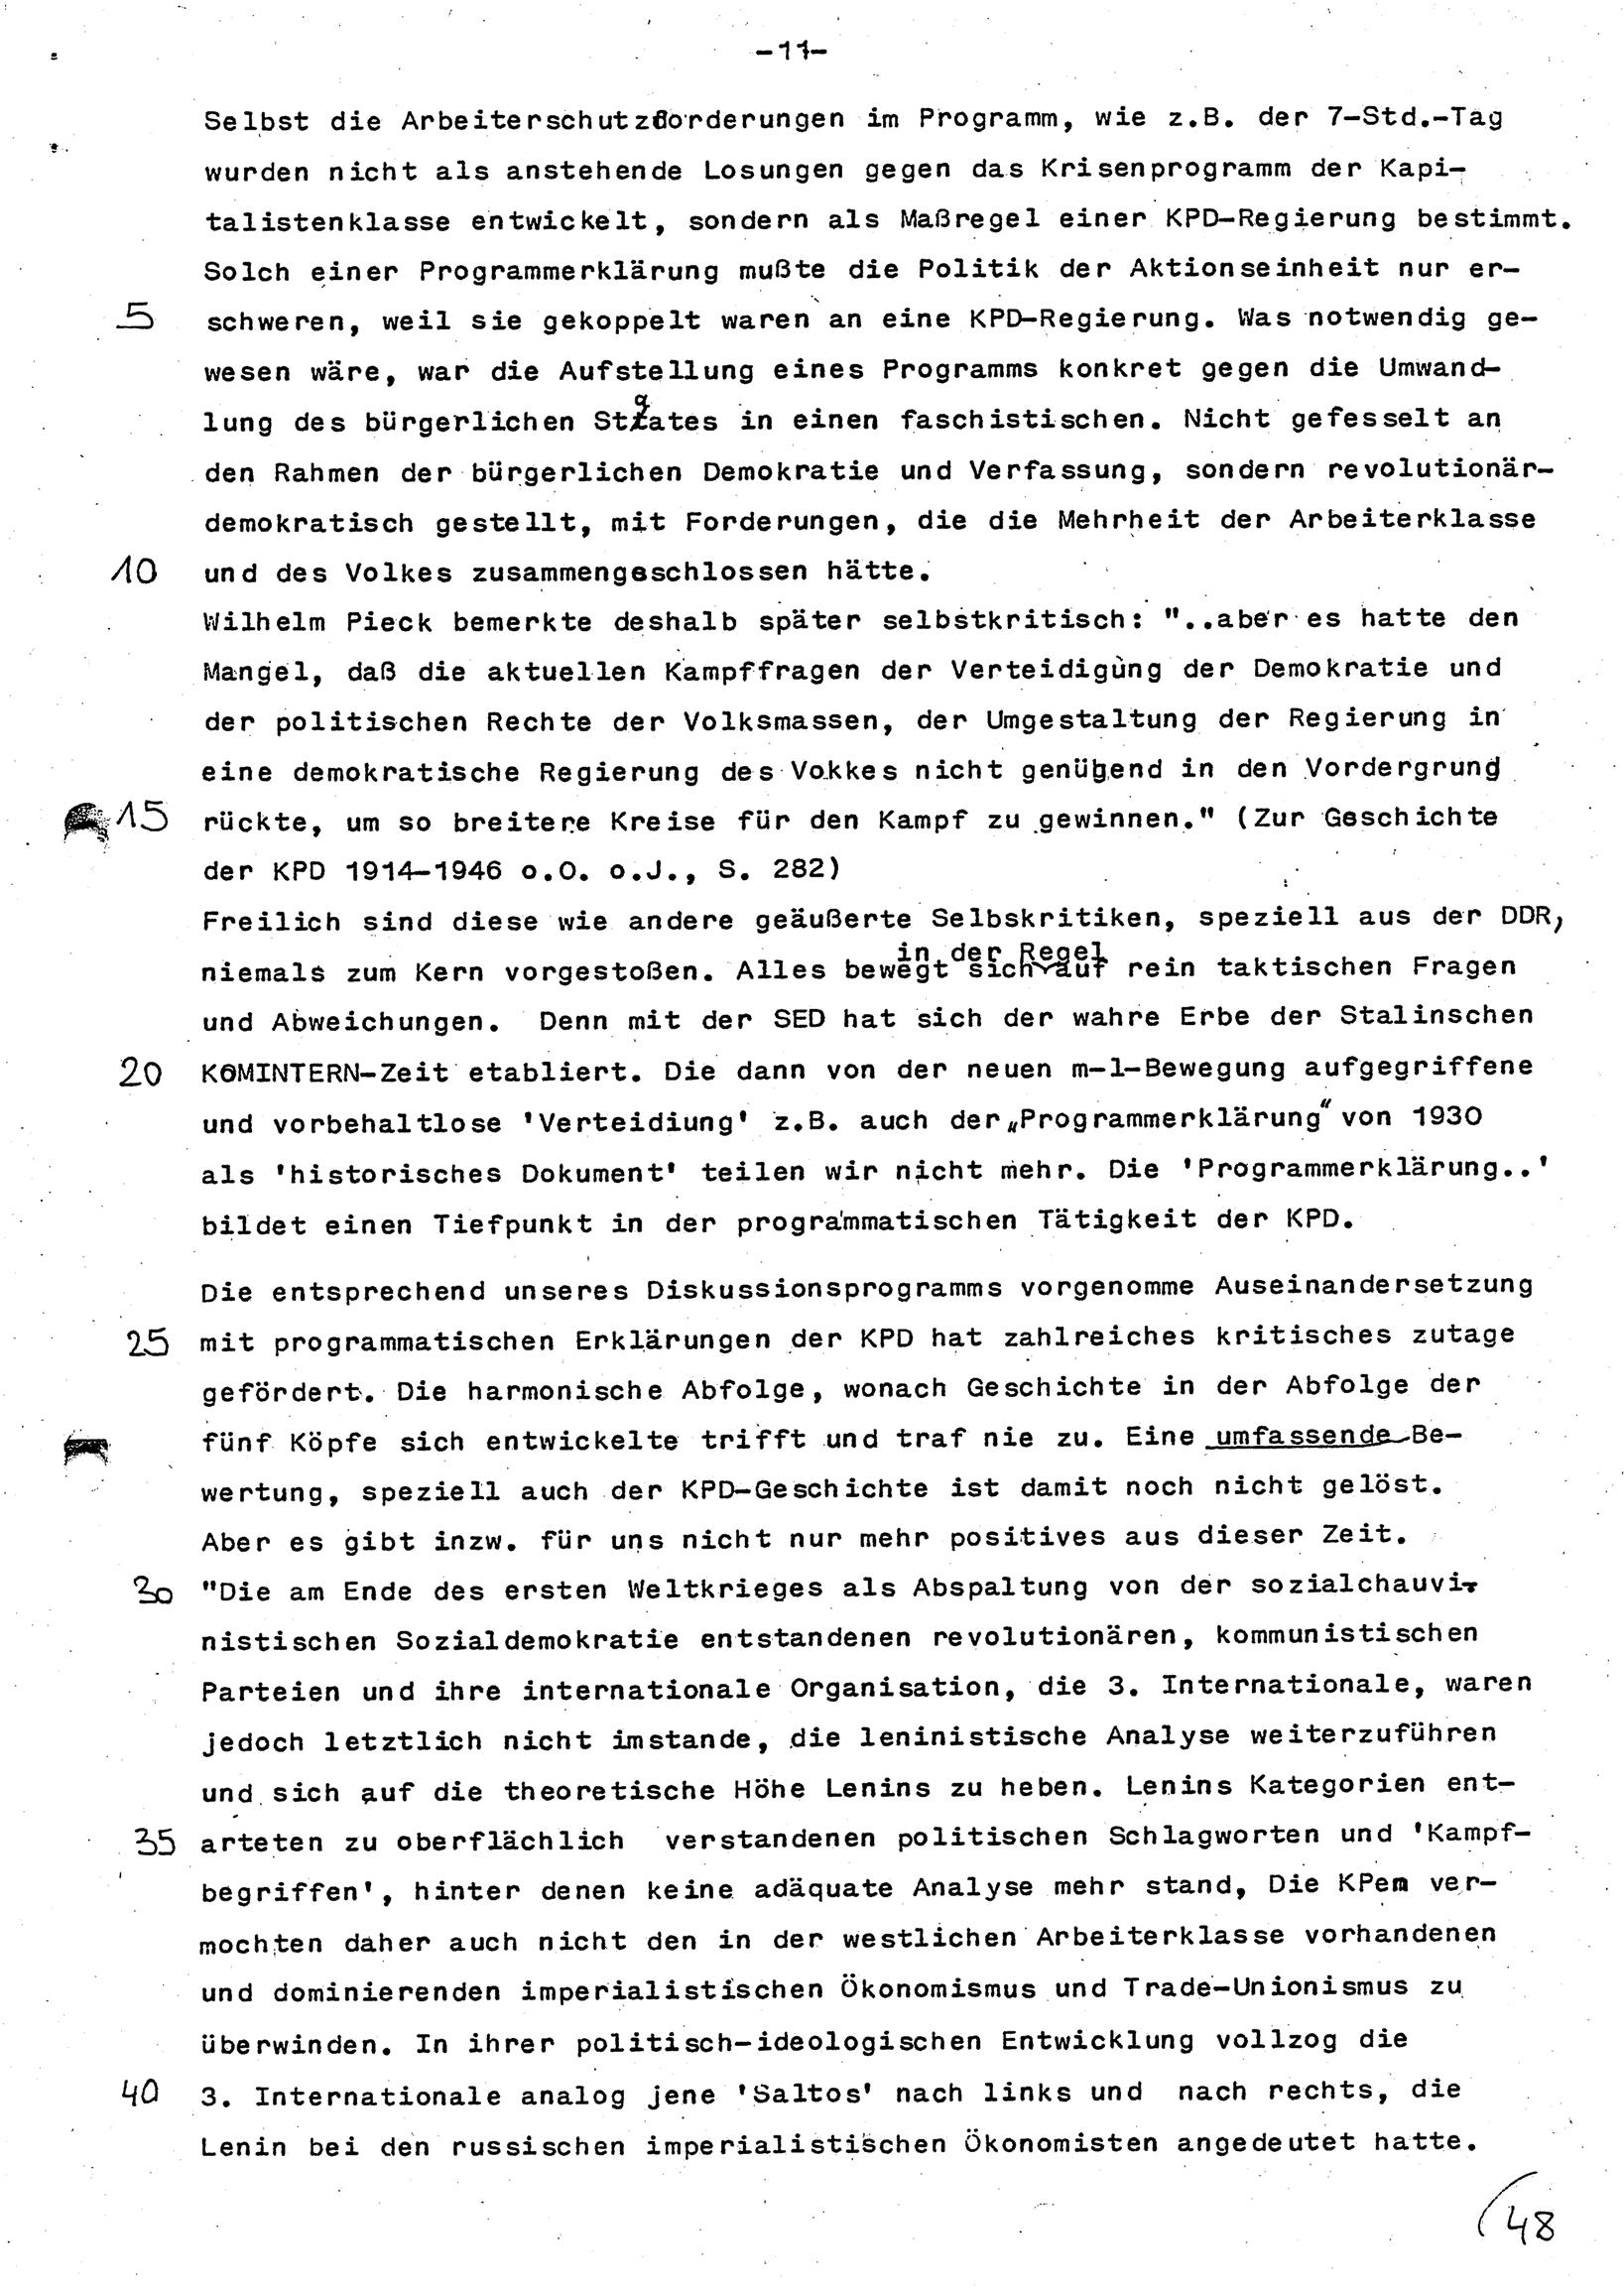 Ulm_KGU_Arbeitsheft_19830425_015_051